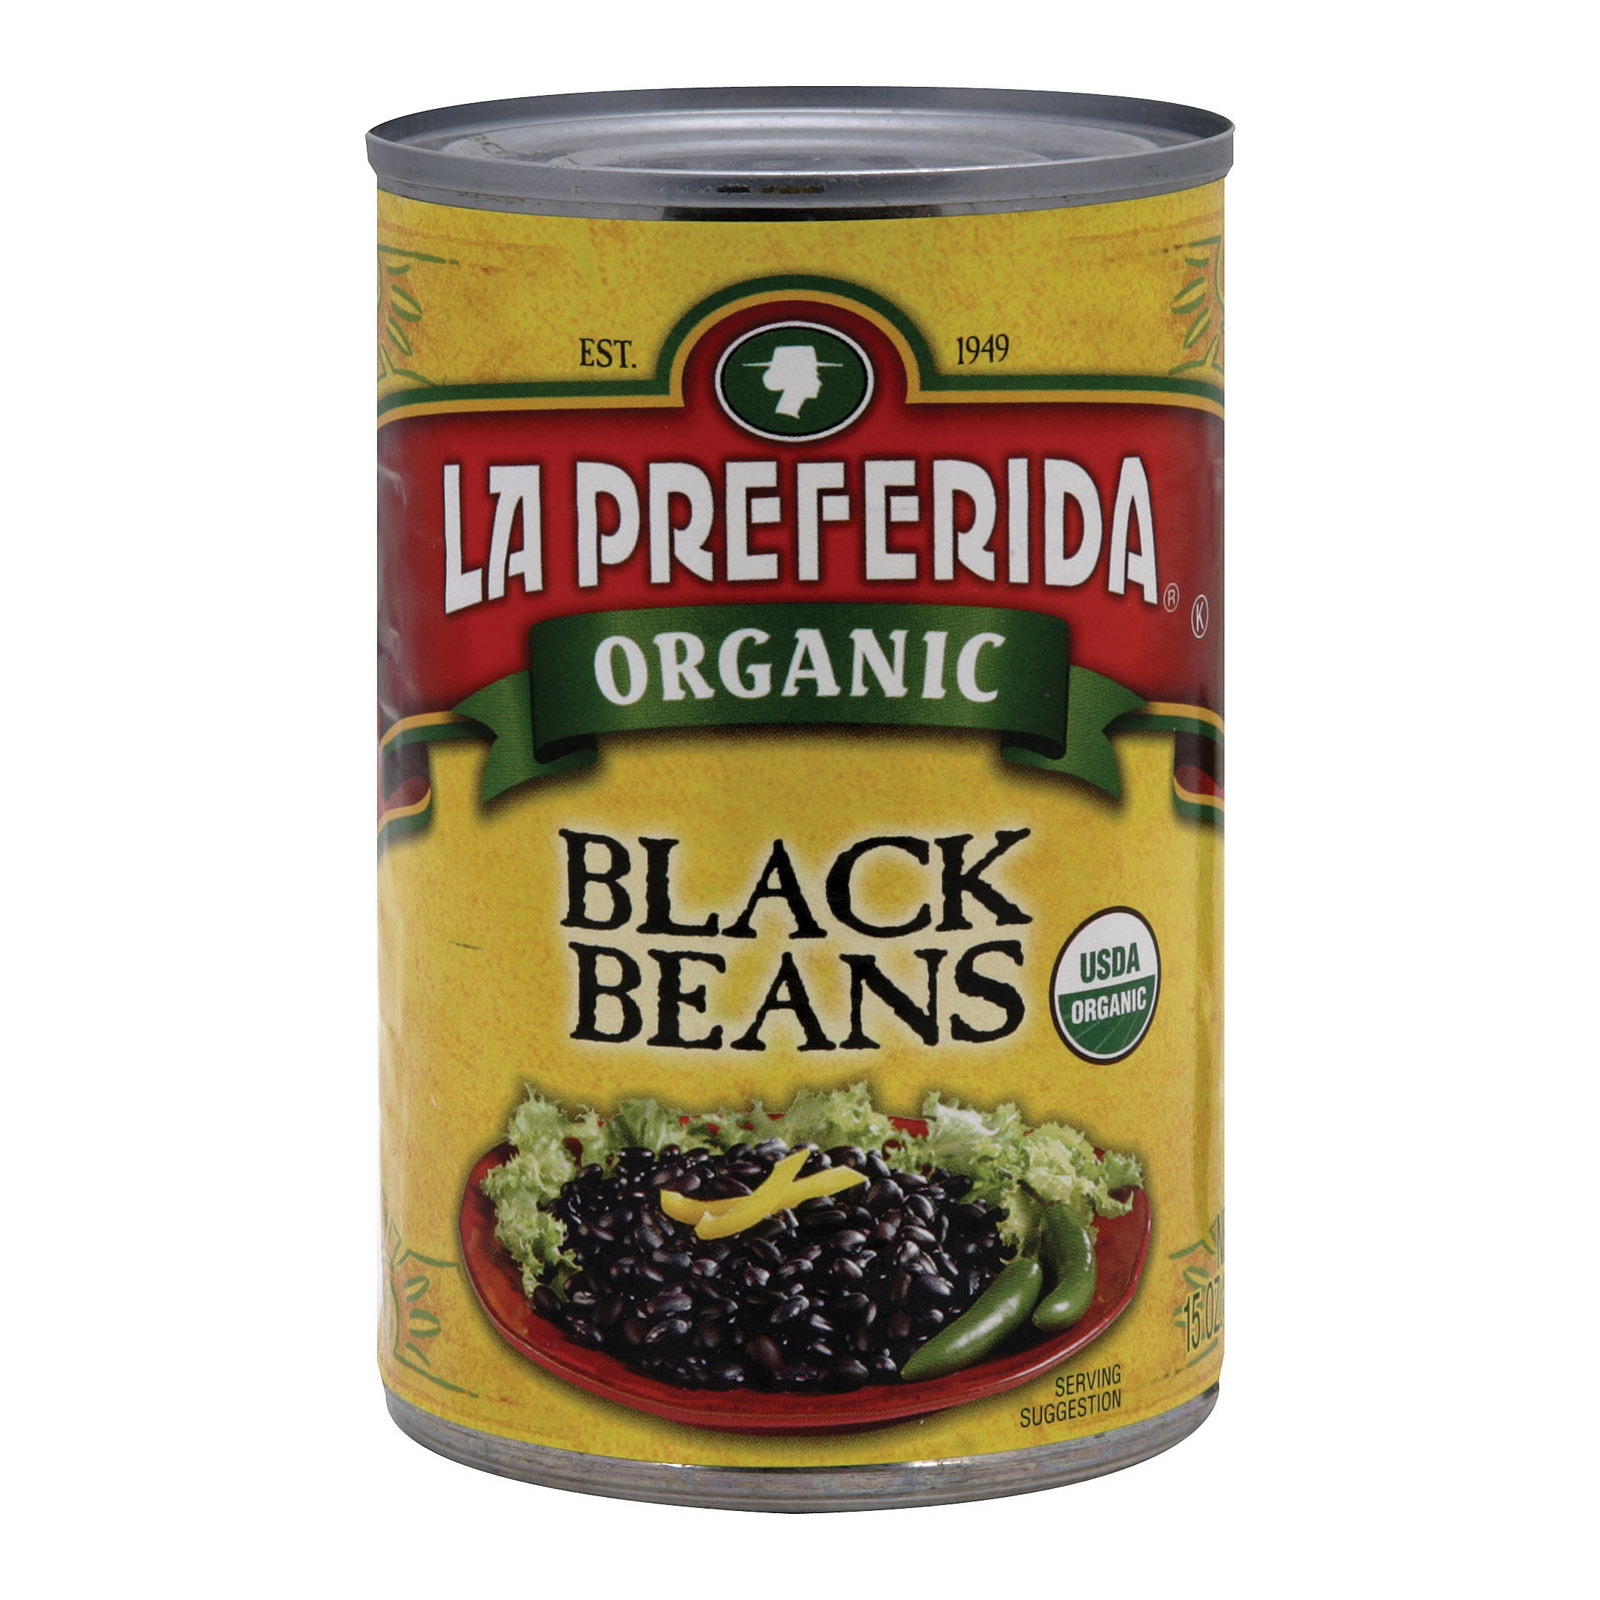 La Preferida Organic Black Beans - Case of 12 - 15 oz